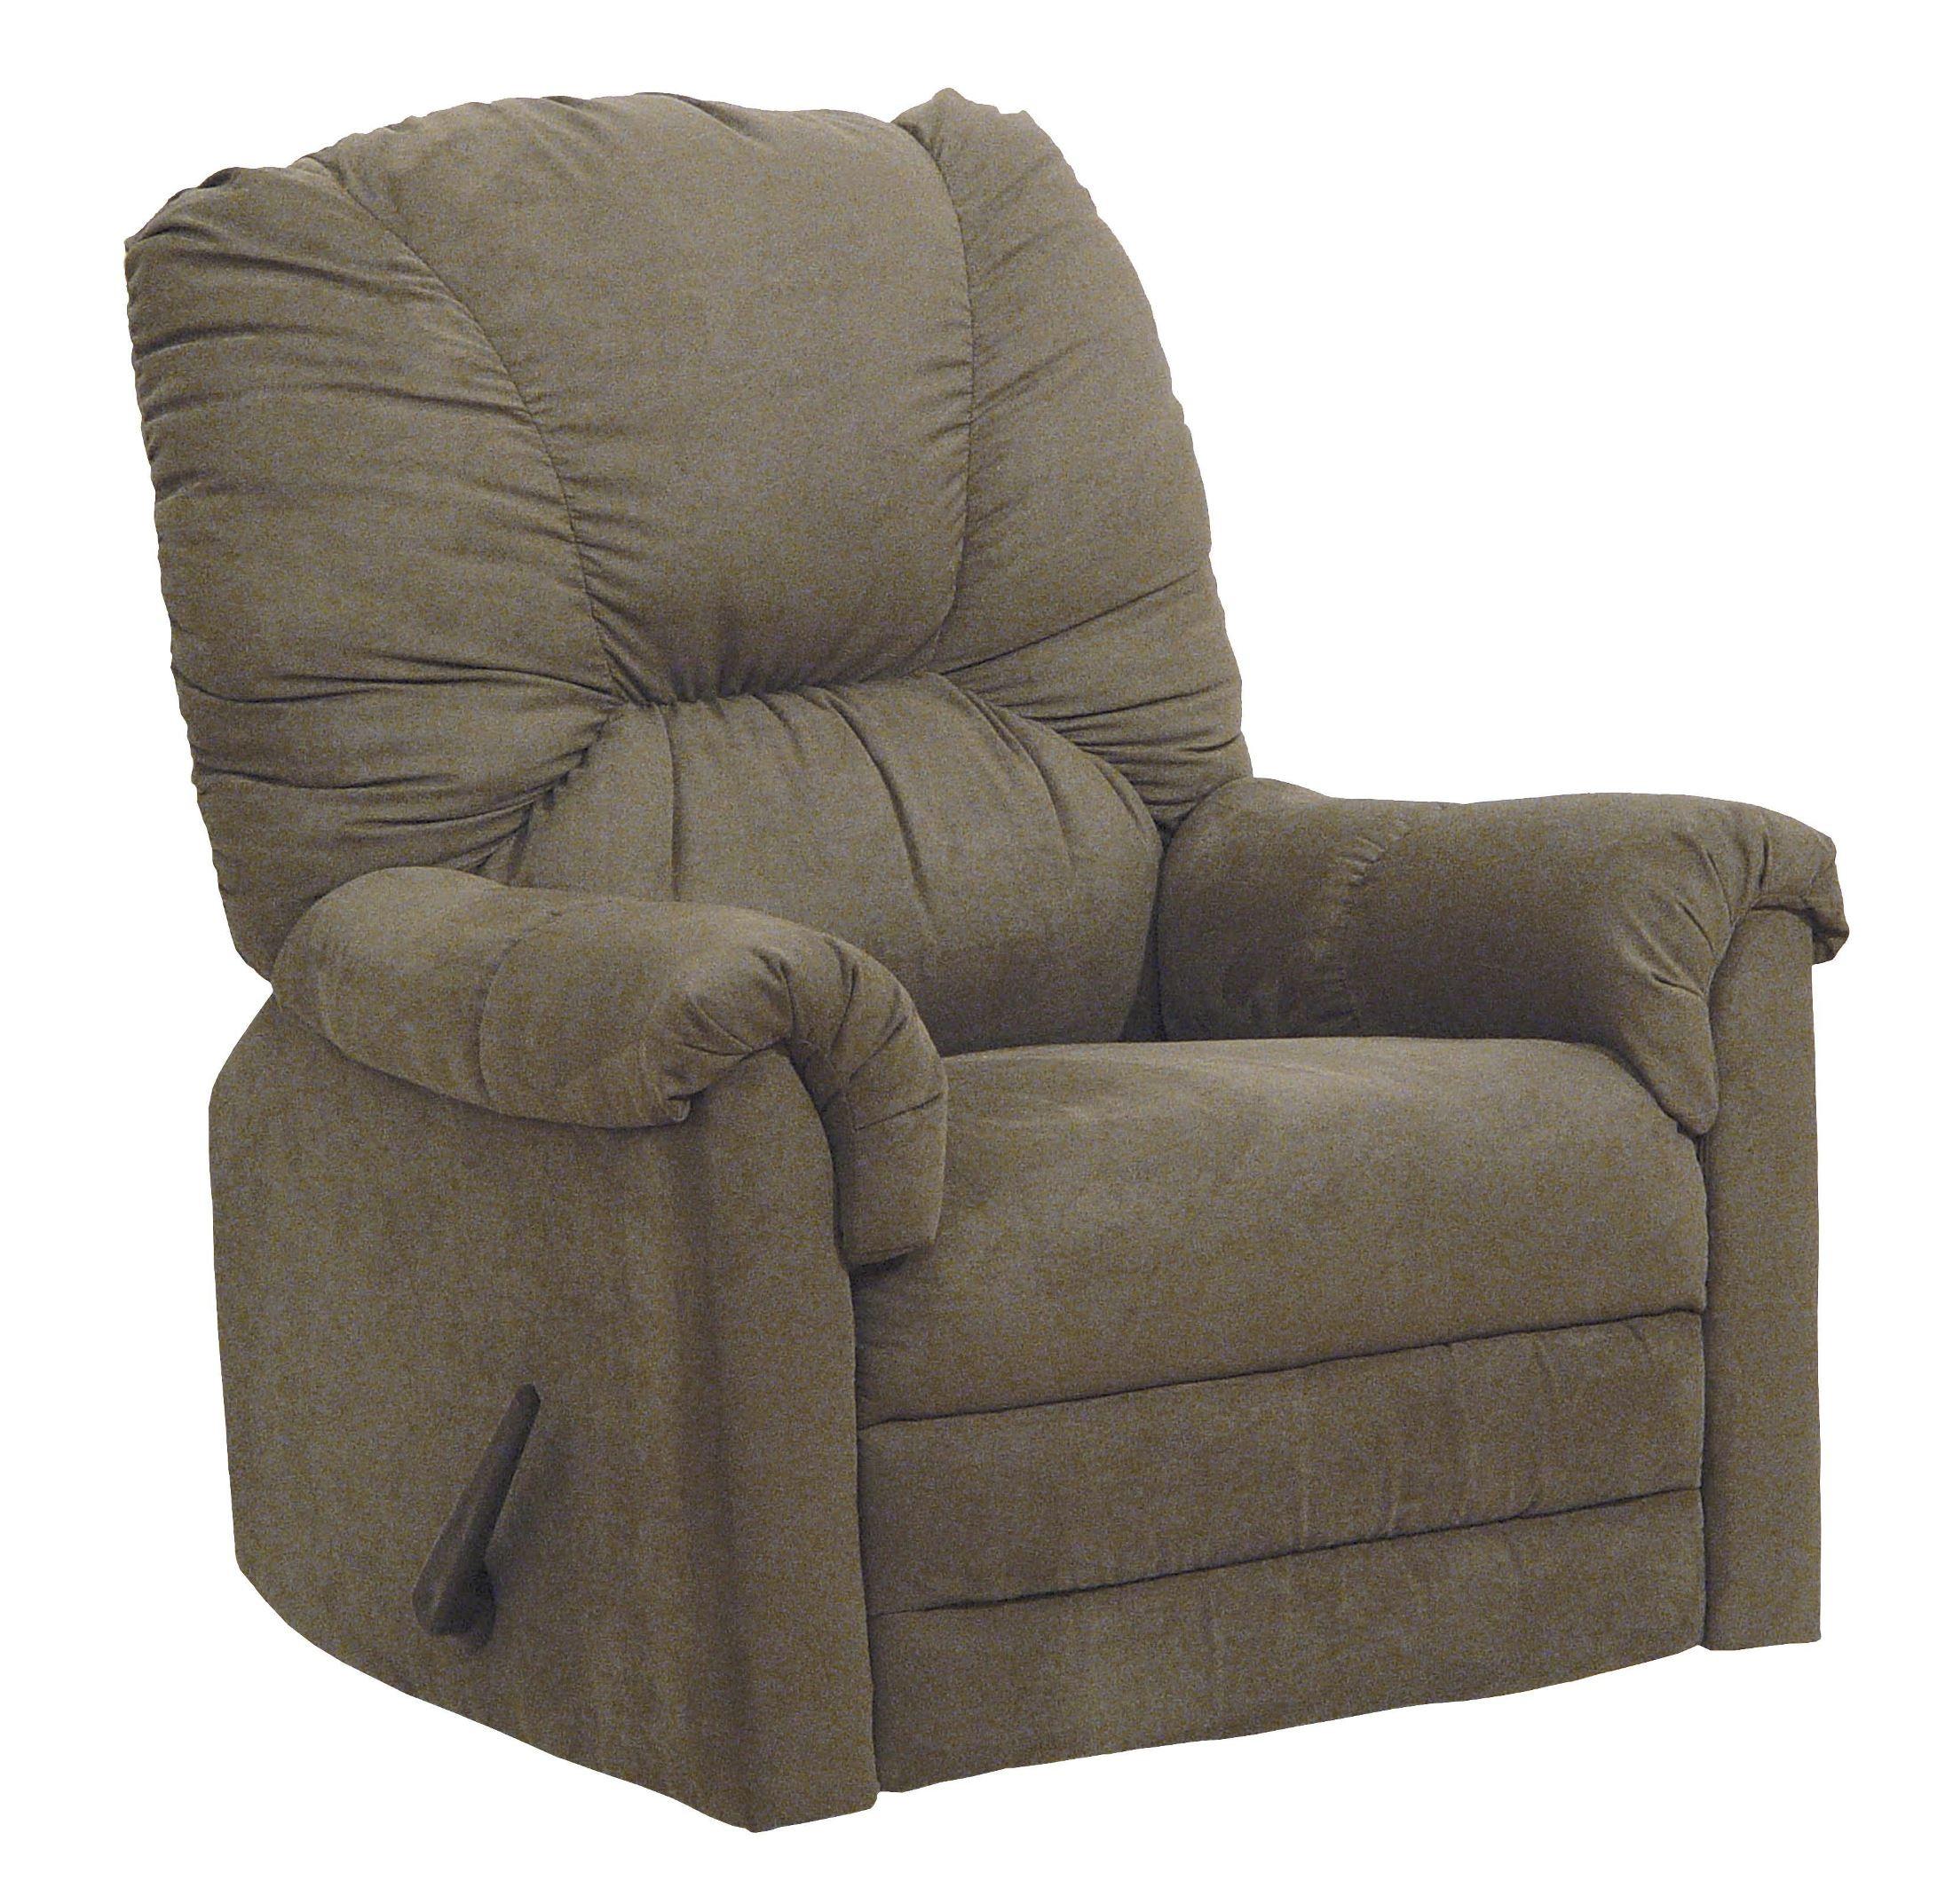 Winner herbal rocker recliner from catnapper 42342211215 for Catnapper cloud nine chaise recliner